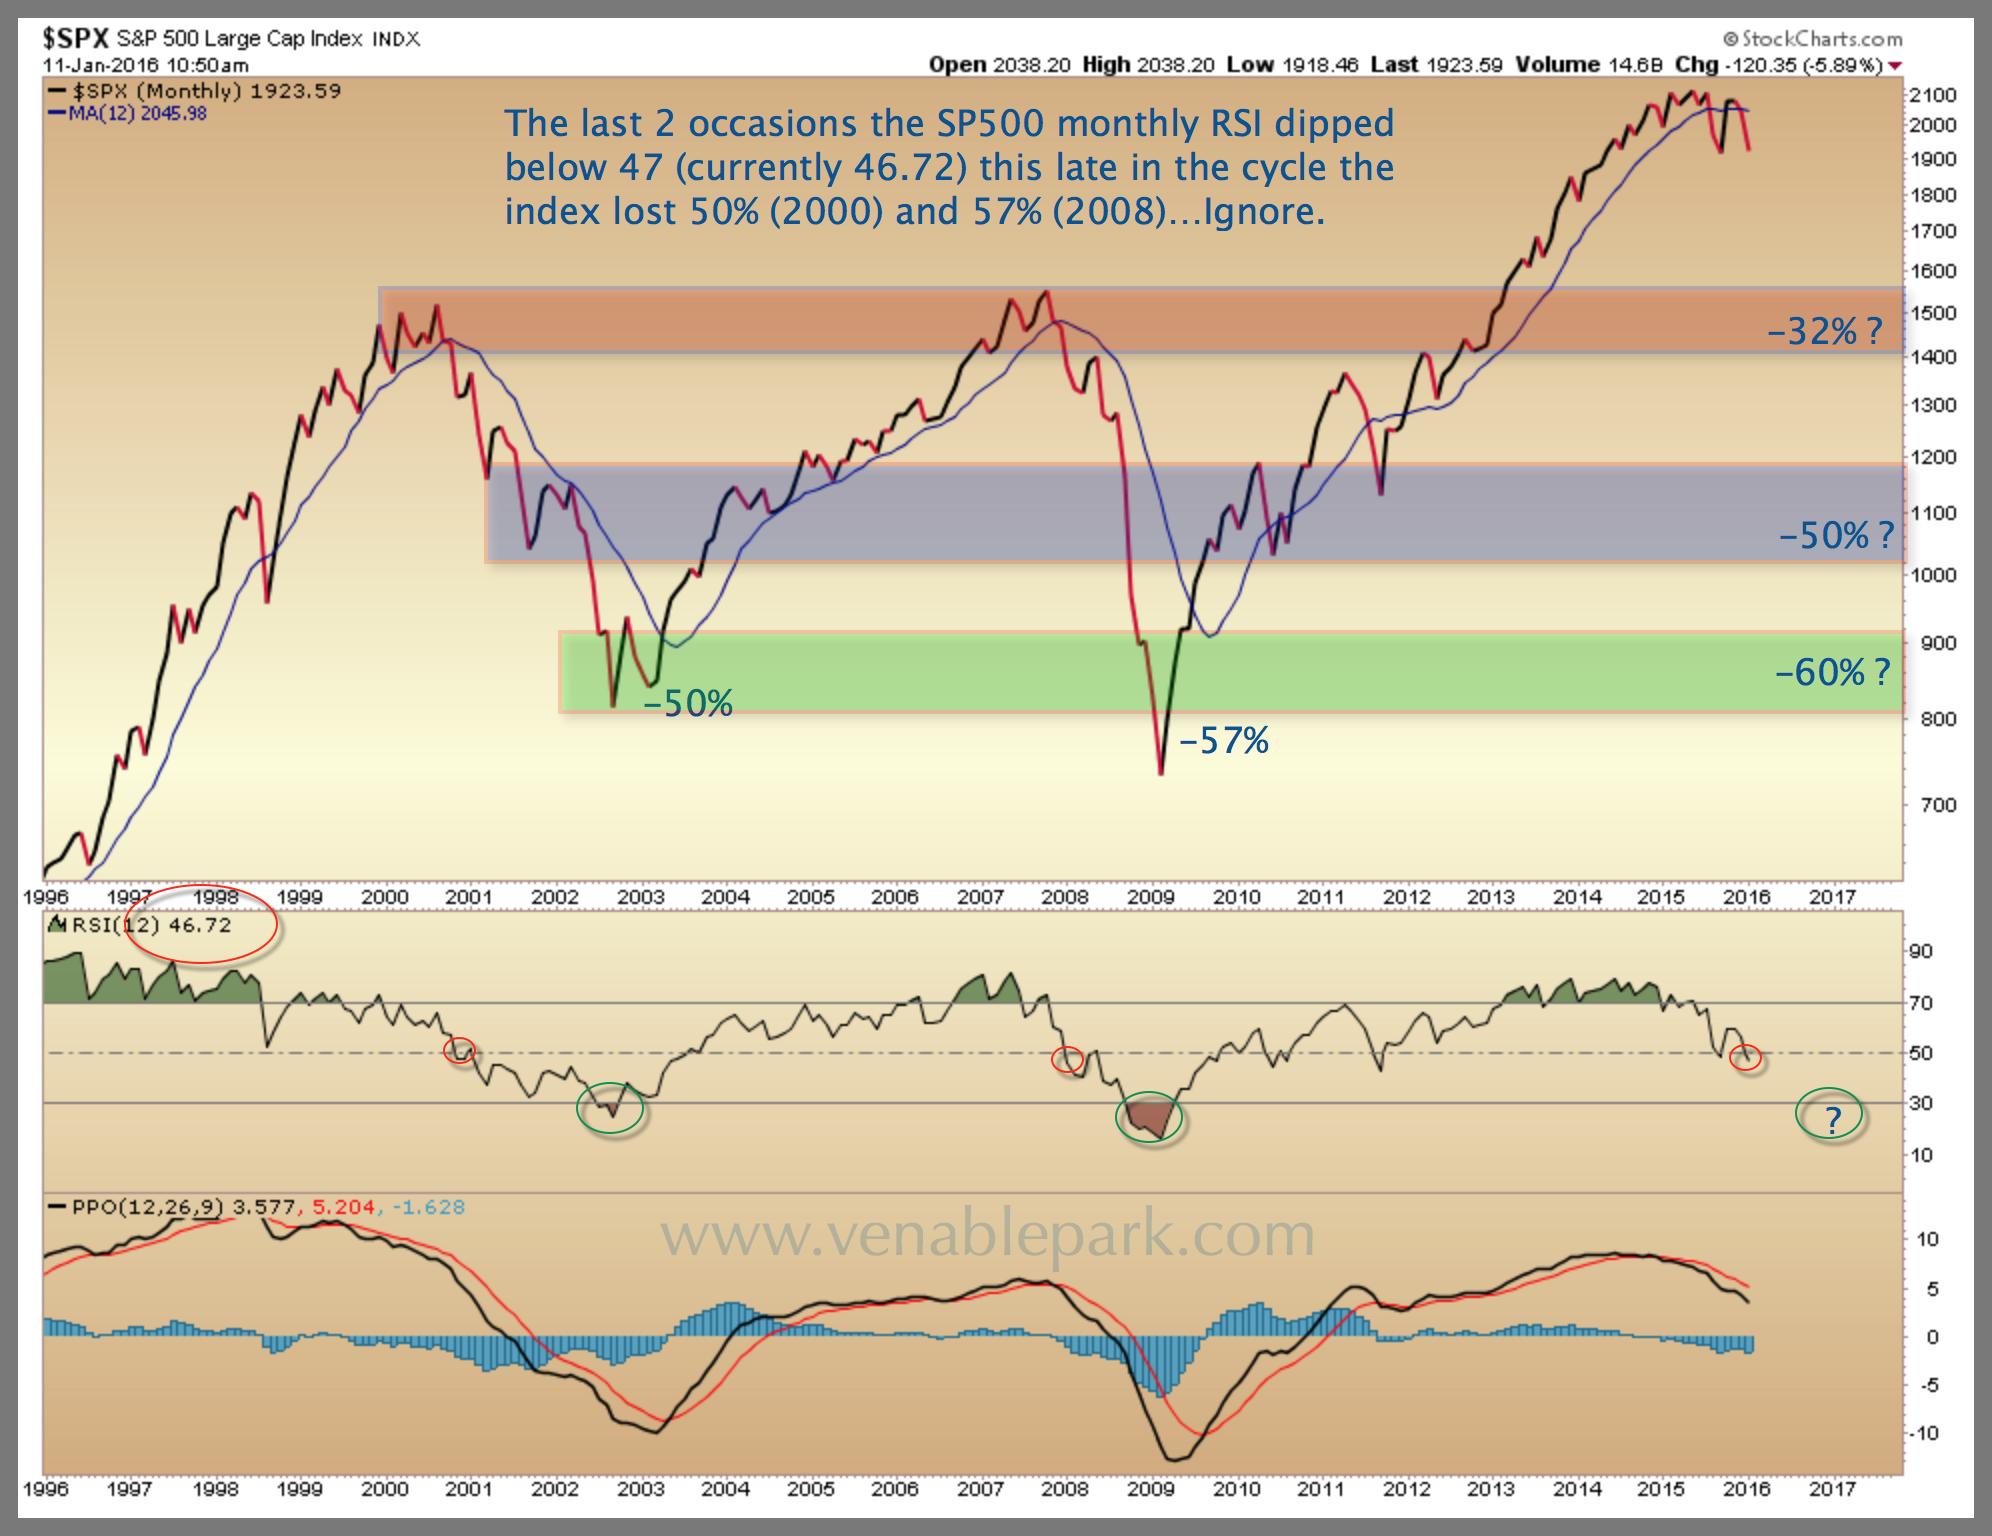 S&P 500 Jan 11, 2016